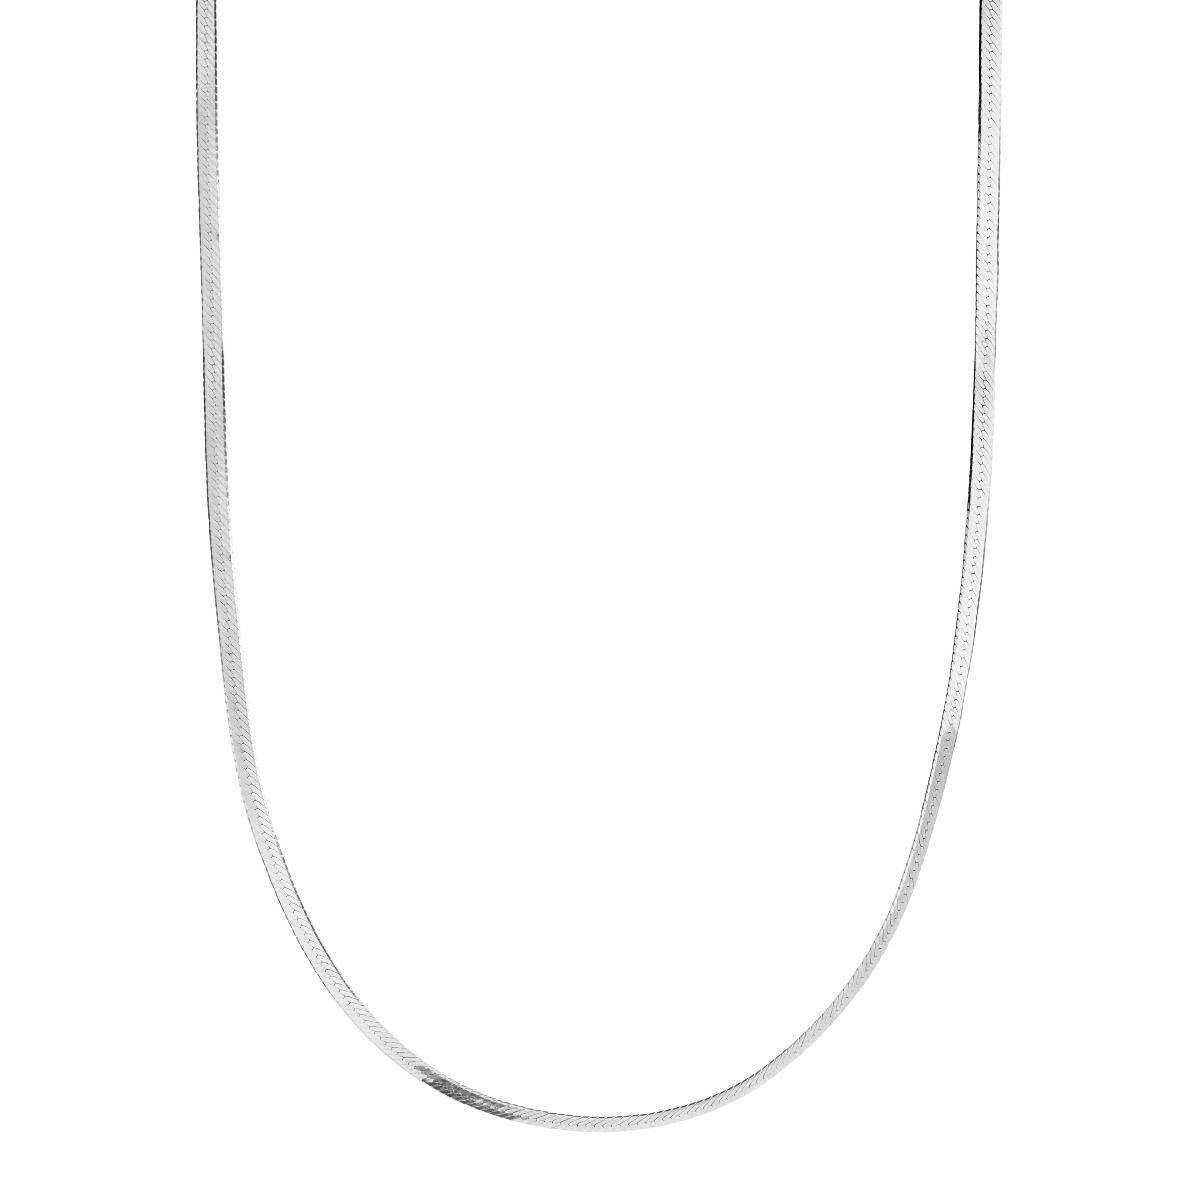 Image of Maria Black Mio sølv halskæde - 300380AG